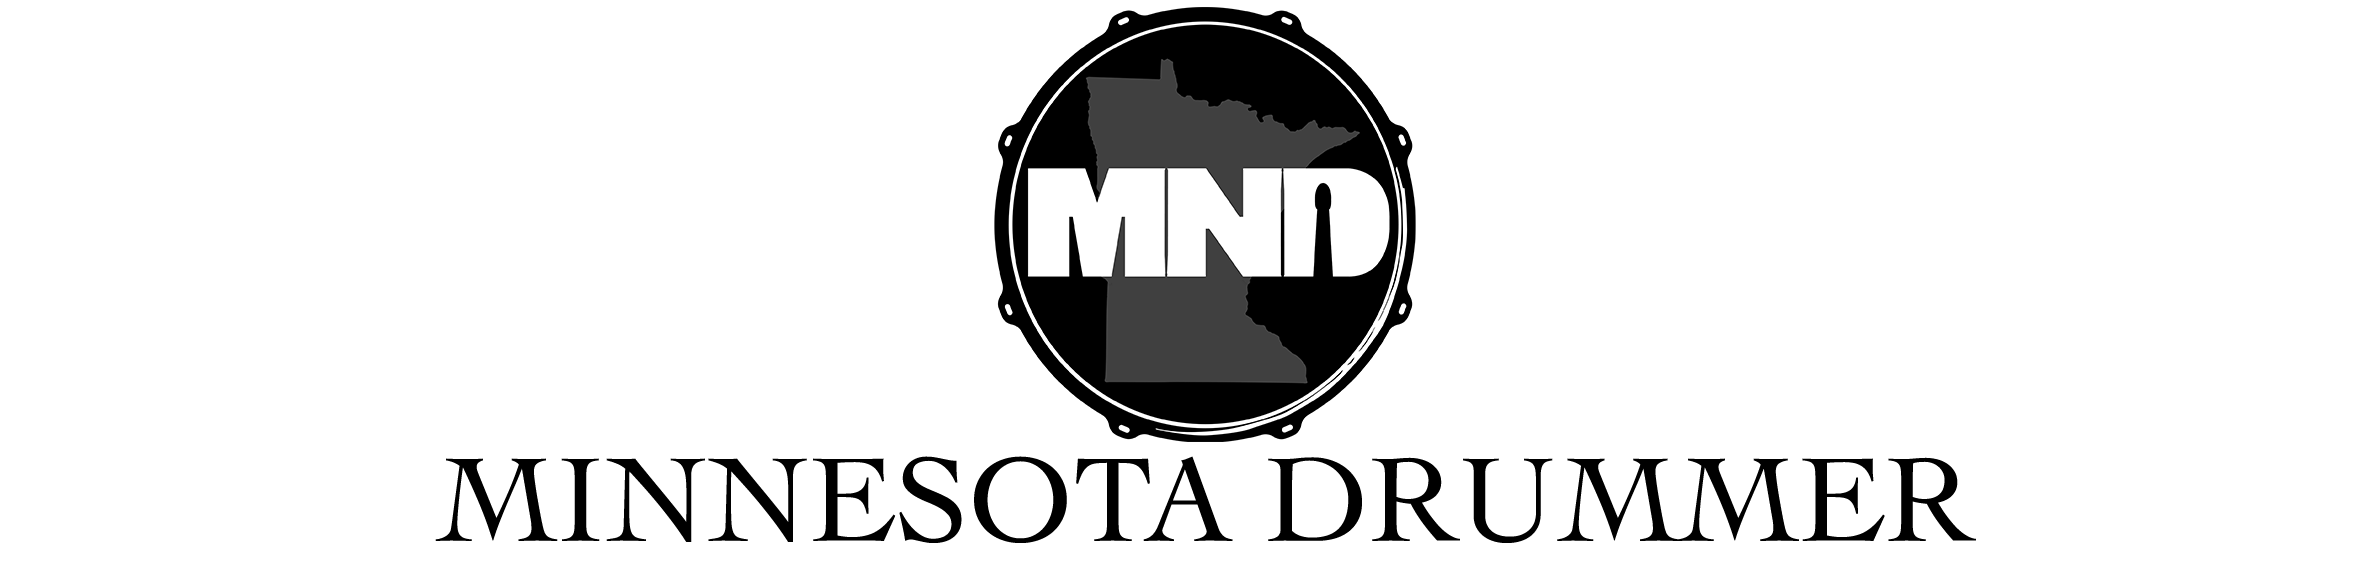 Minnesota Drummer